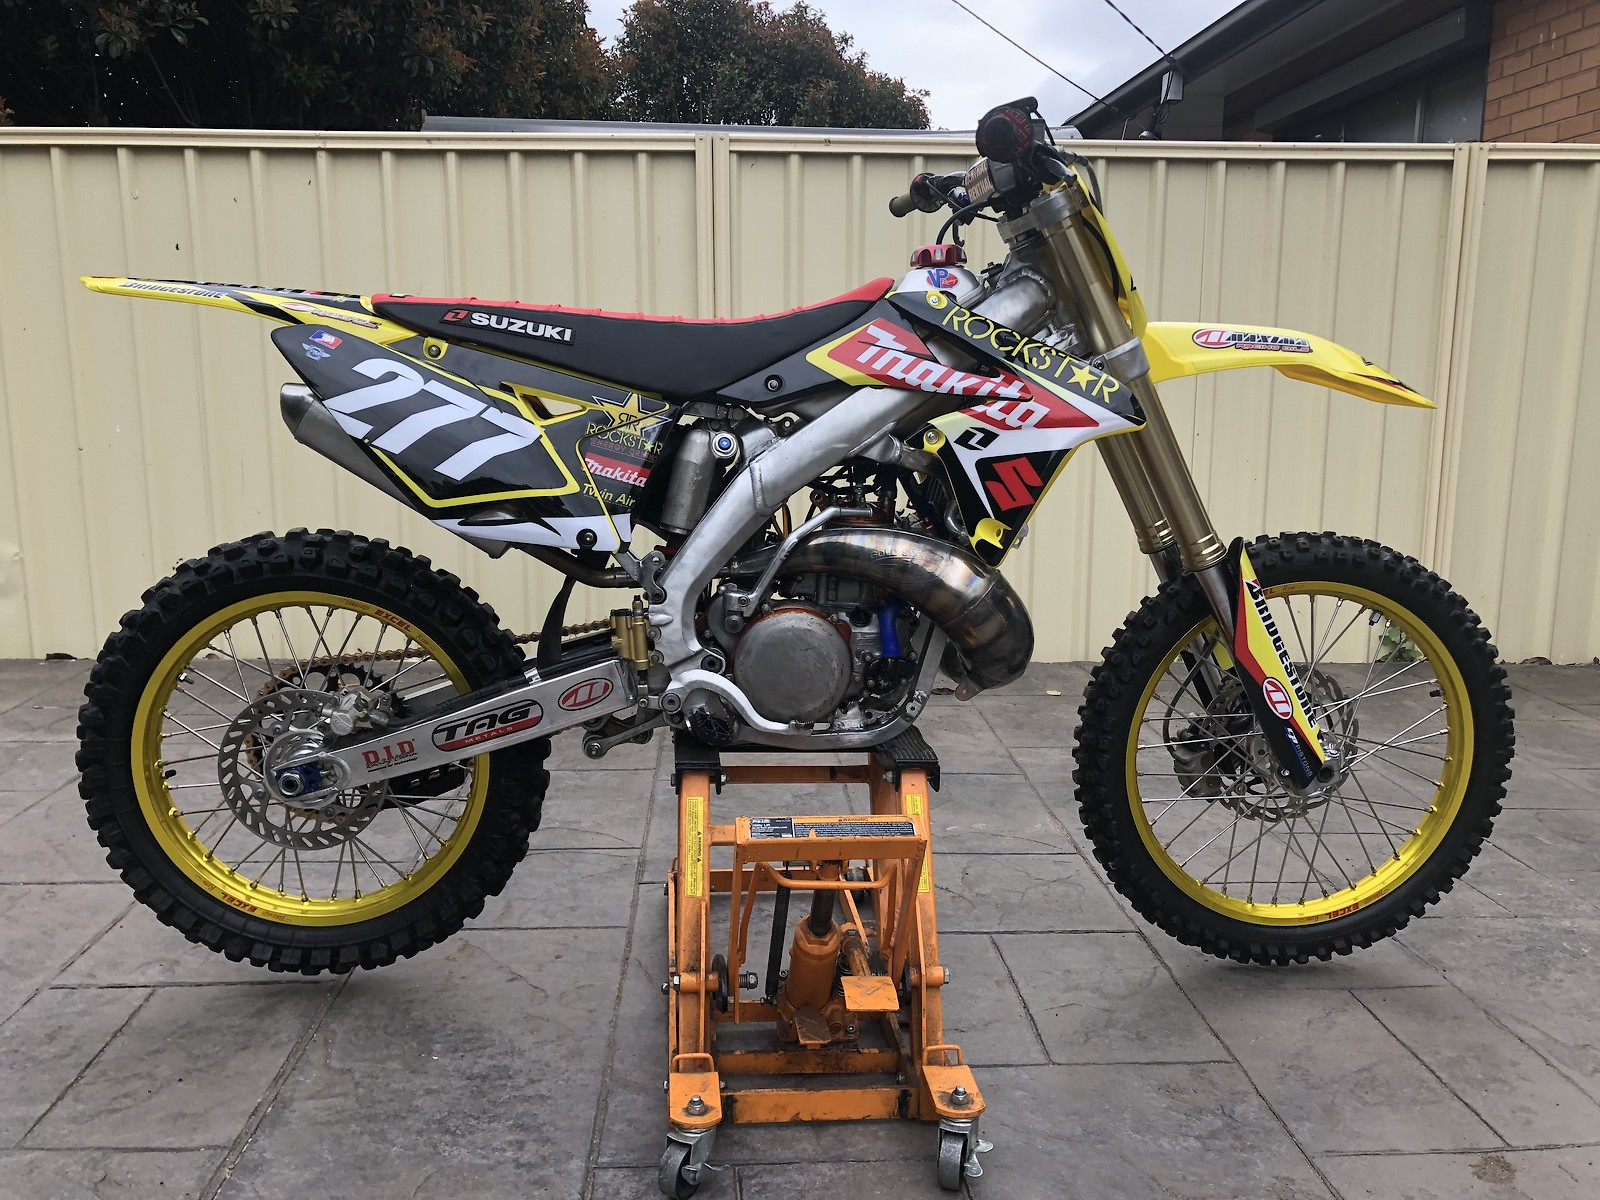 2FFD14BF-42BA-482A-8049-EE5BA9E68F1D - Jesse Jones - Motocross Pictures - Vital MX